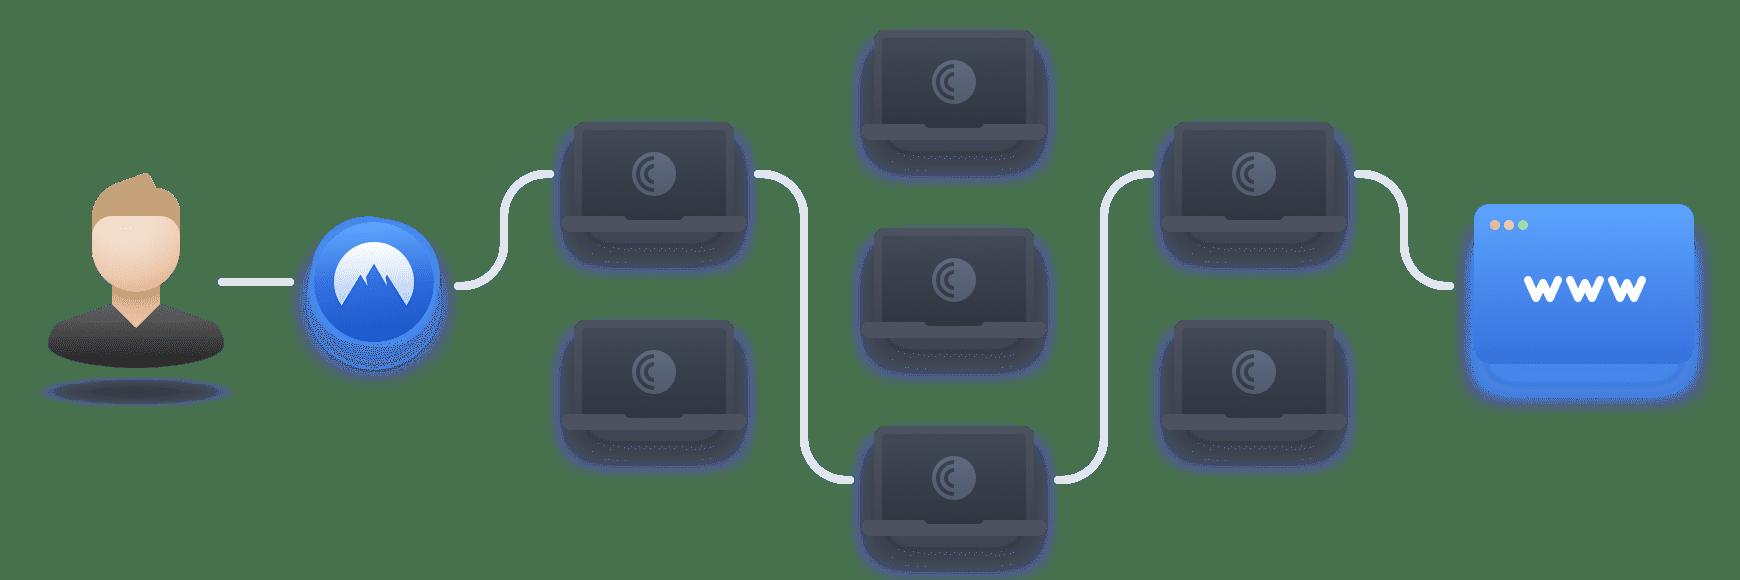 Access Onion Over VPN: Maximize Your Safety Minimum 2x | NordVPN